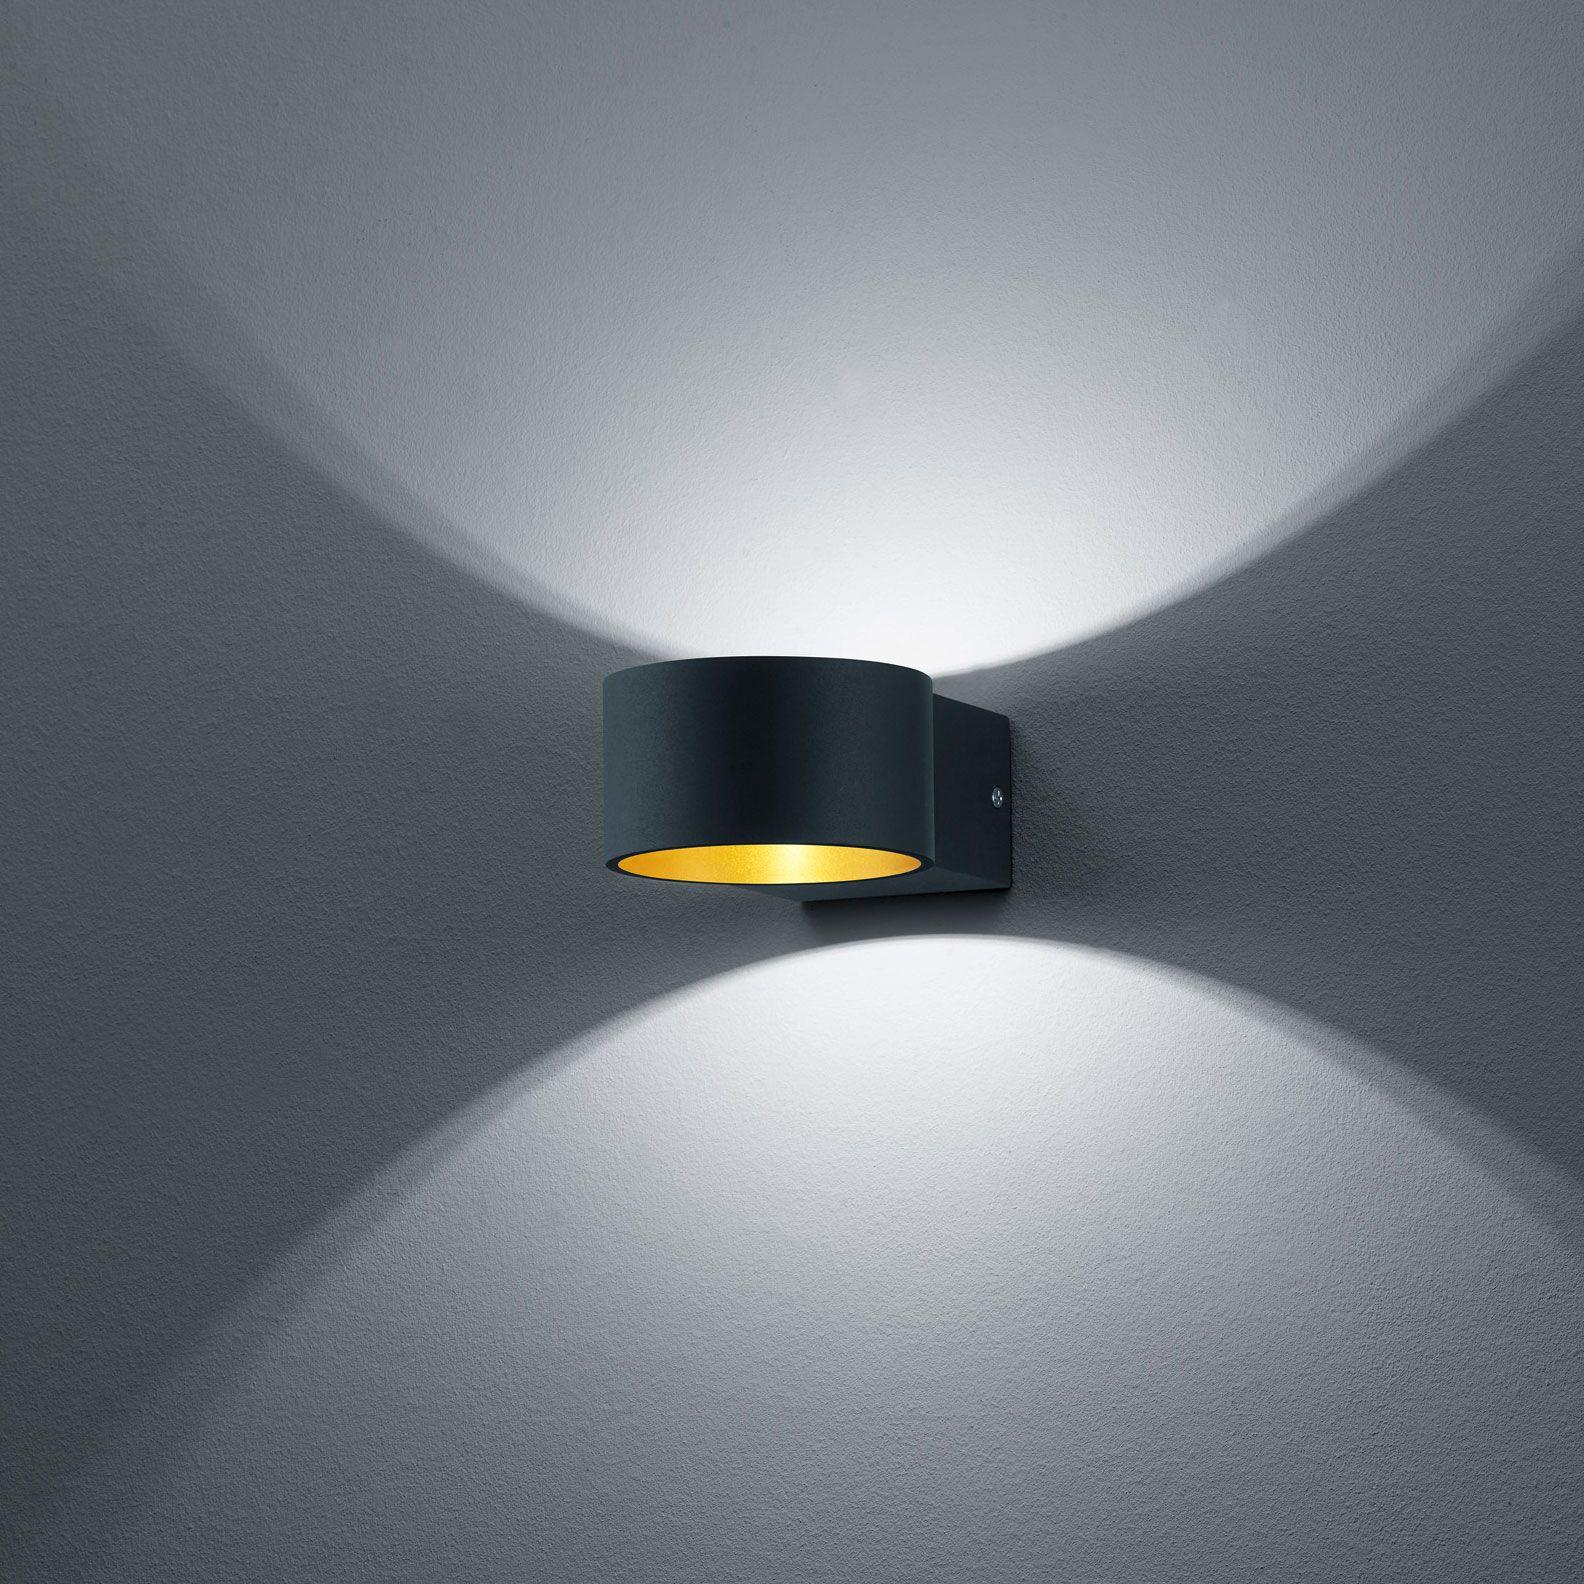 Lacapo Wall Light By Arnsberg 223410132 Wall Lights Wireless Wall Sconce Light